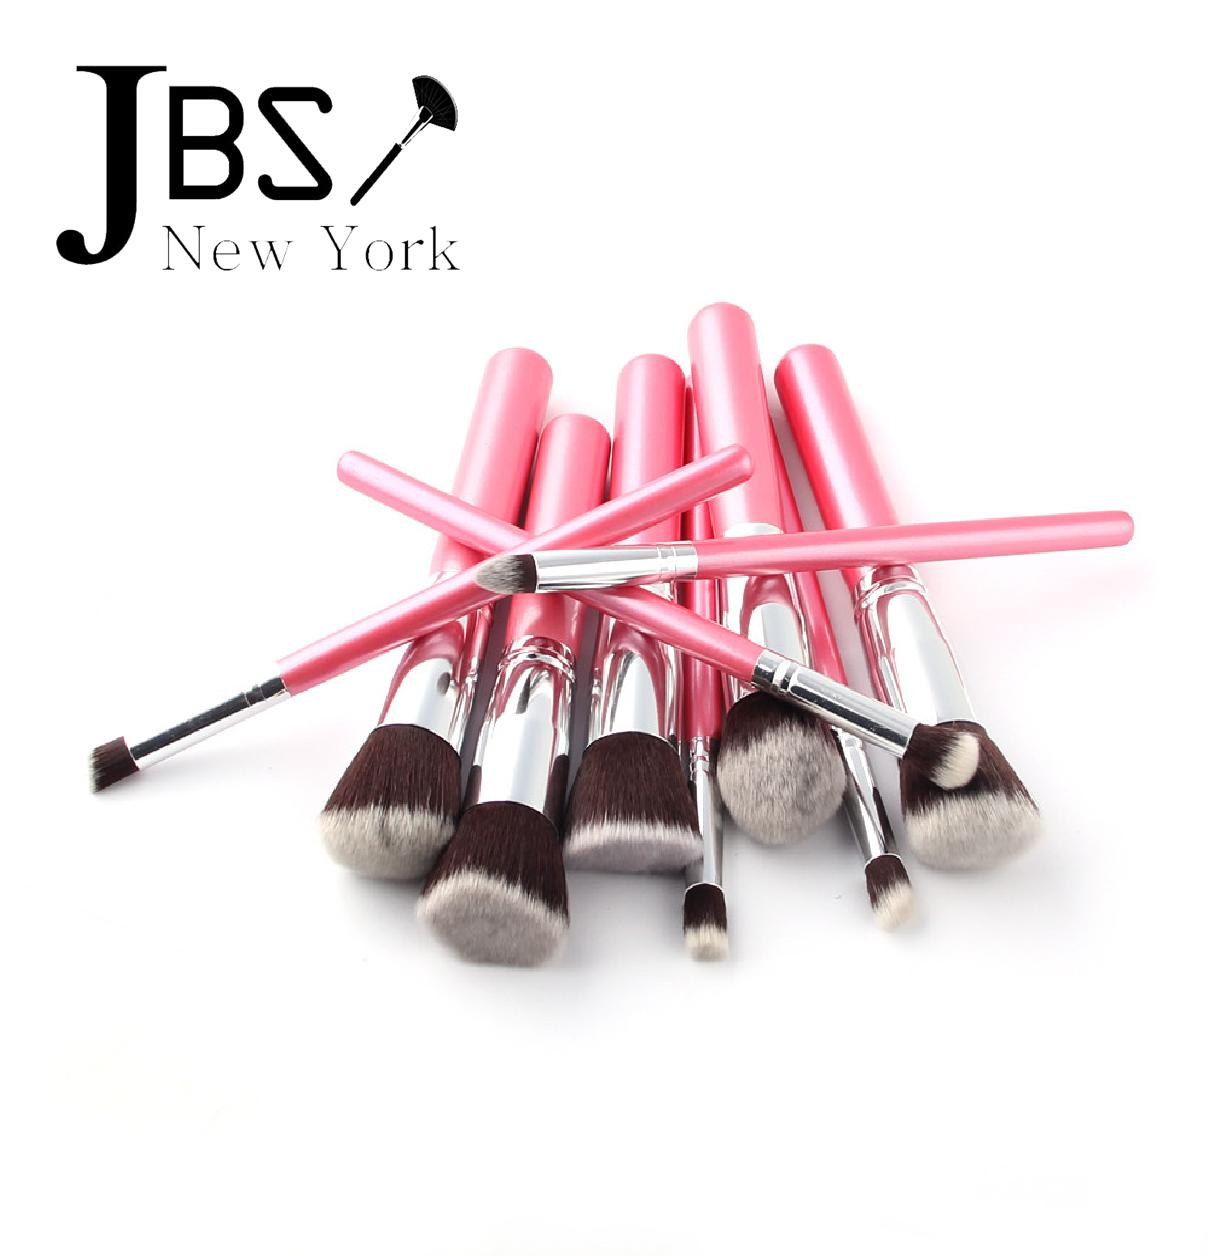 ... JBS Kuas Makeup Brush Set Cosmetic Blending Pencil Brushes Pink - 10 Pcs - Spon Make